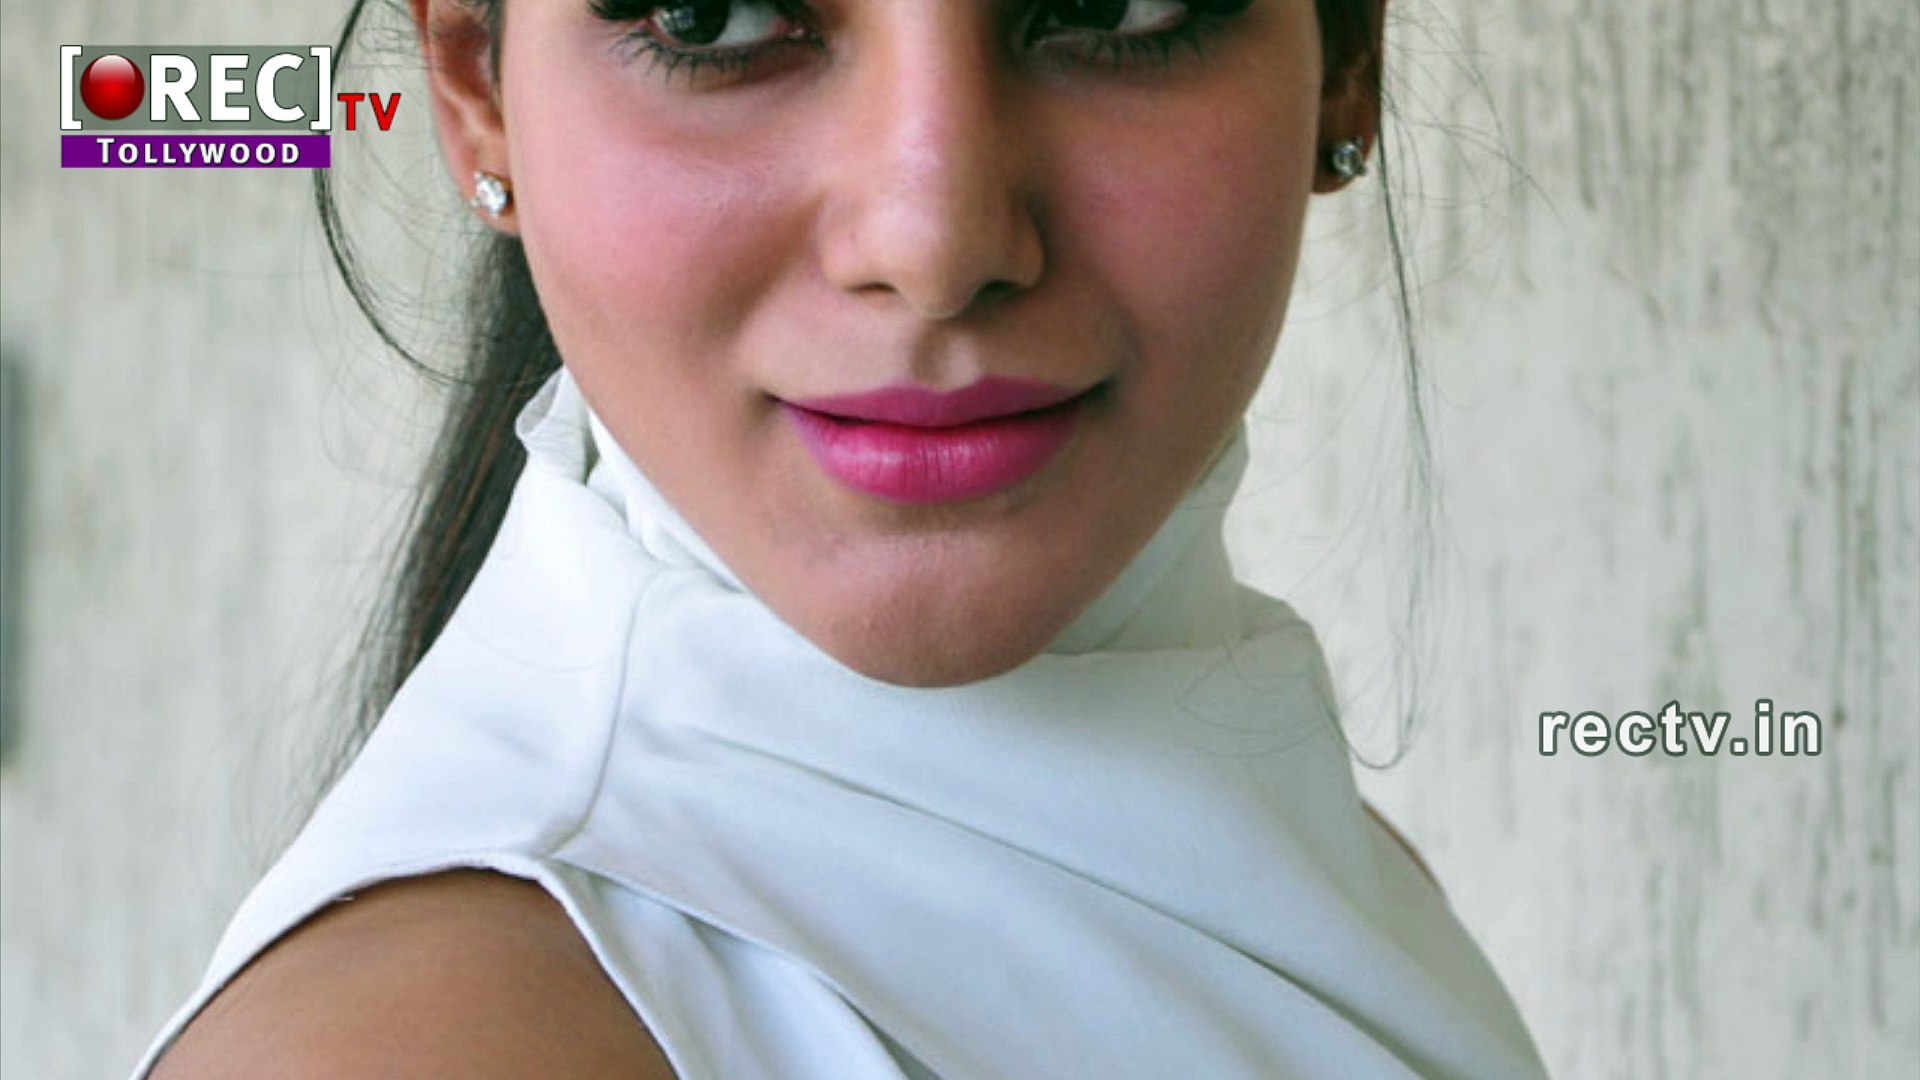 Actress samantha profile stills latest tollywood photo gallery